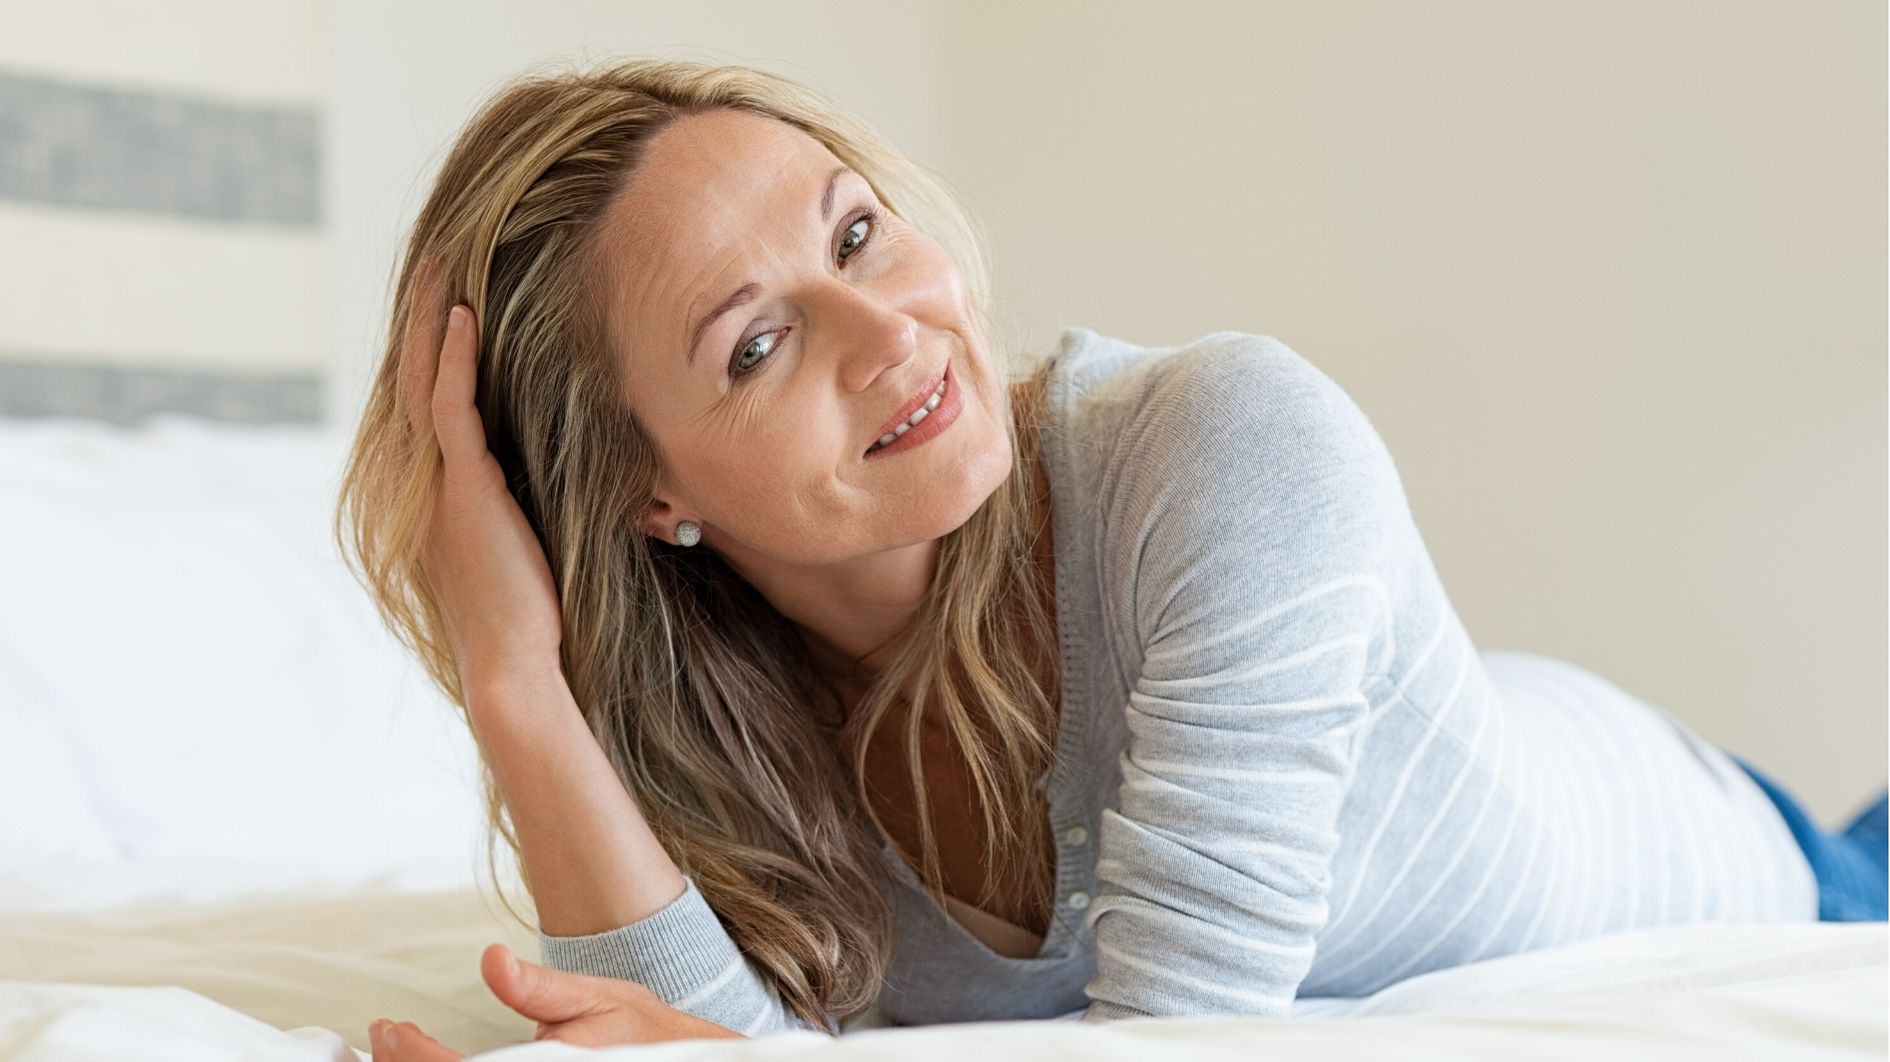 hifu facial treatment pros and cons